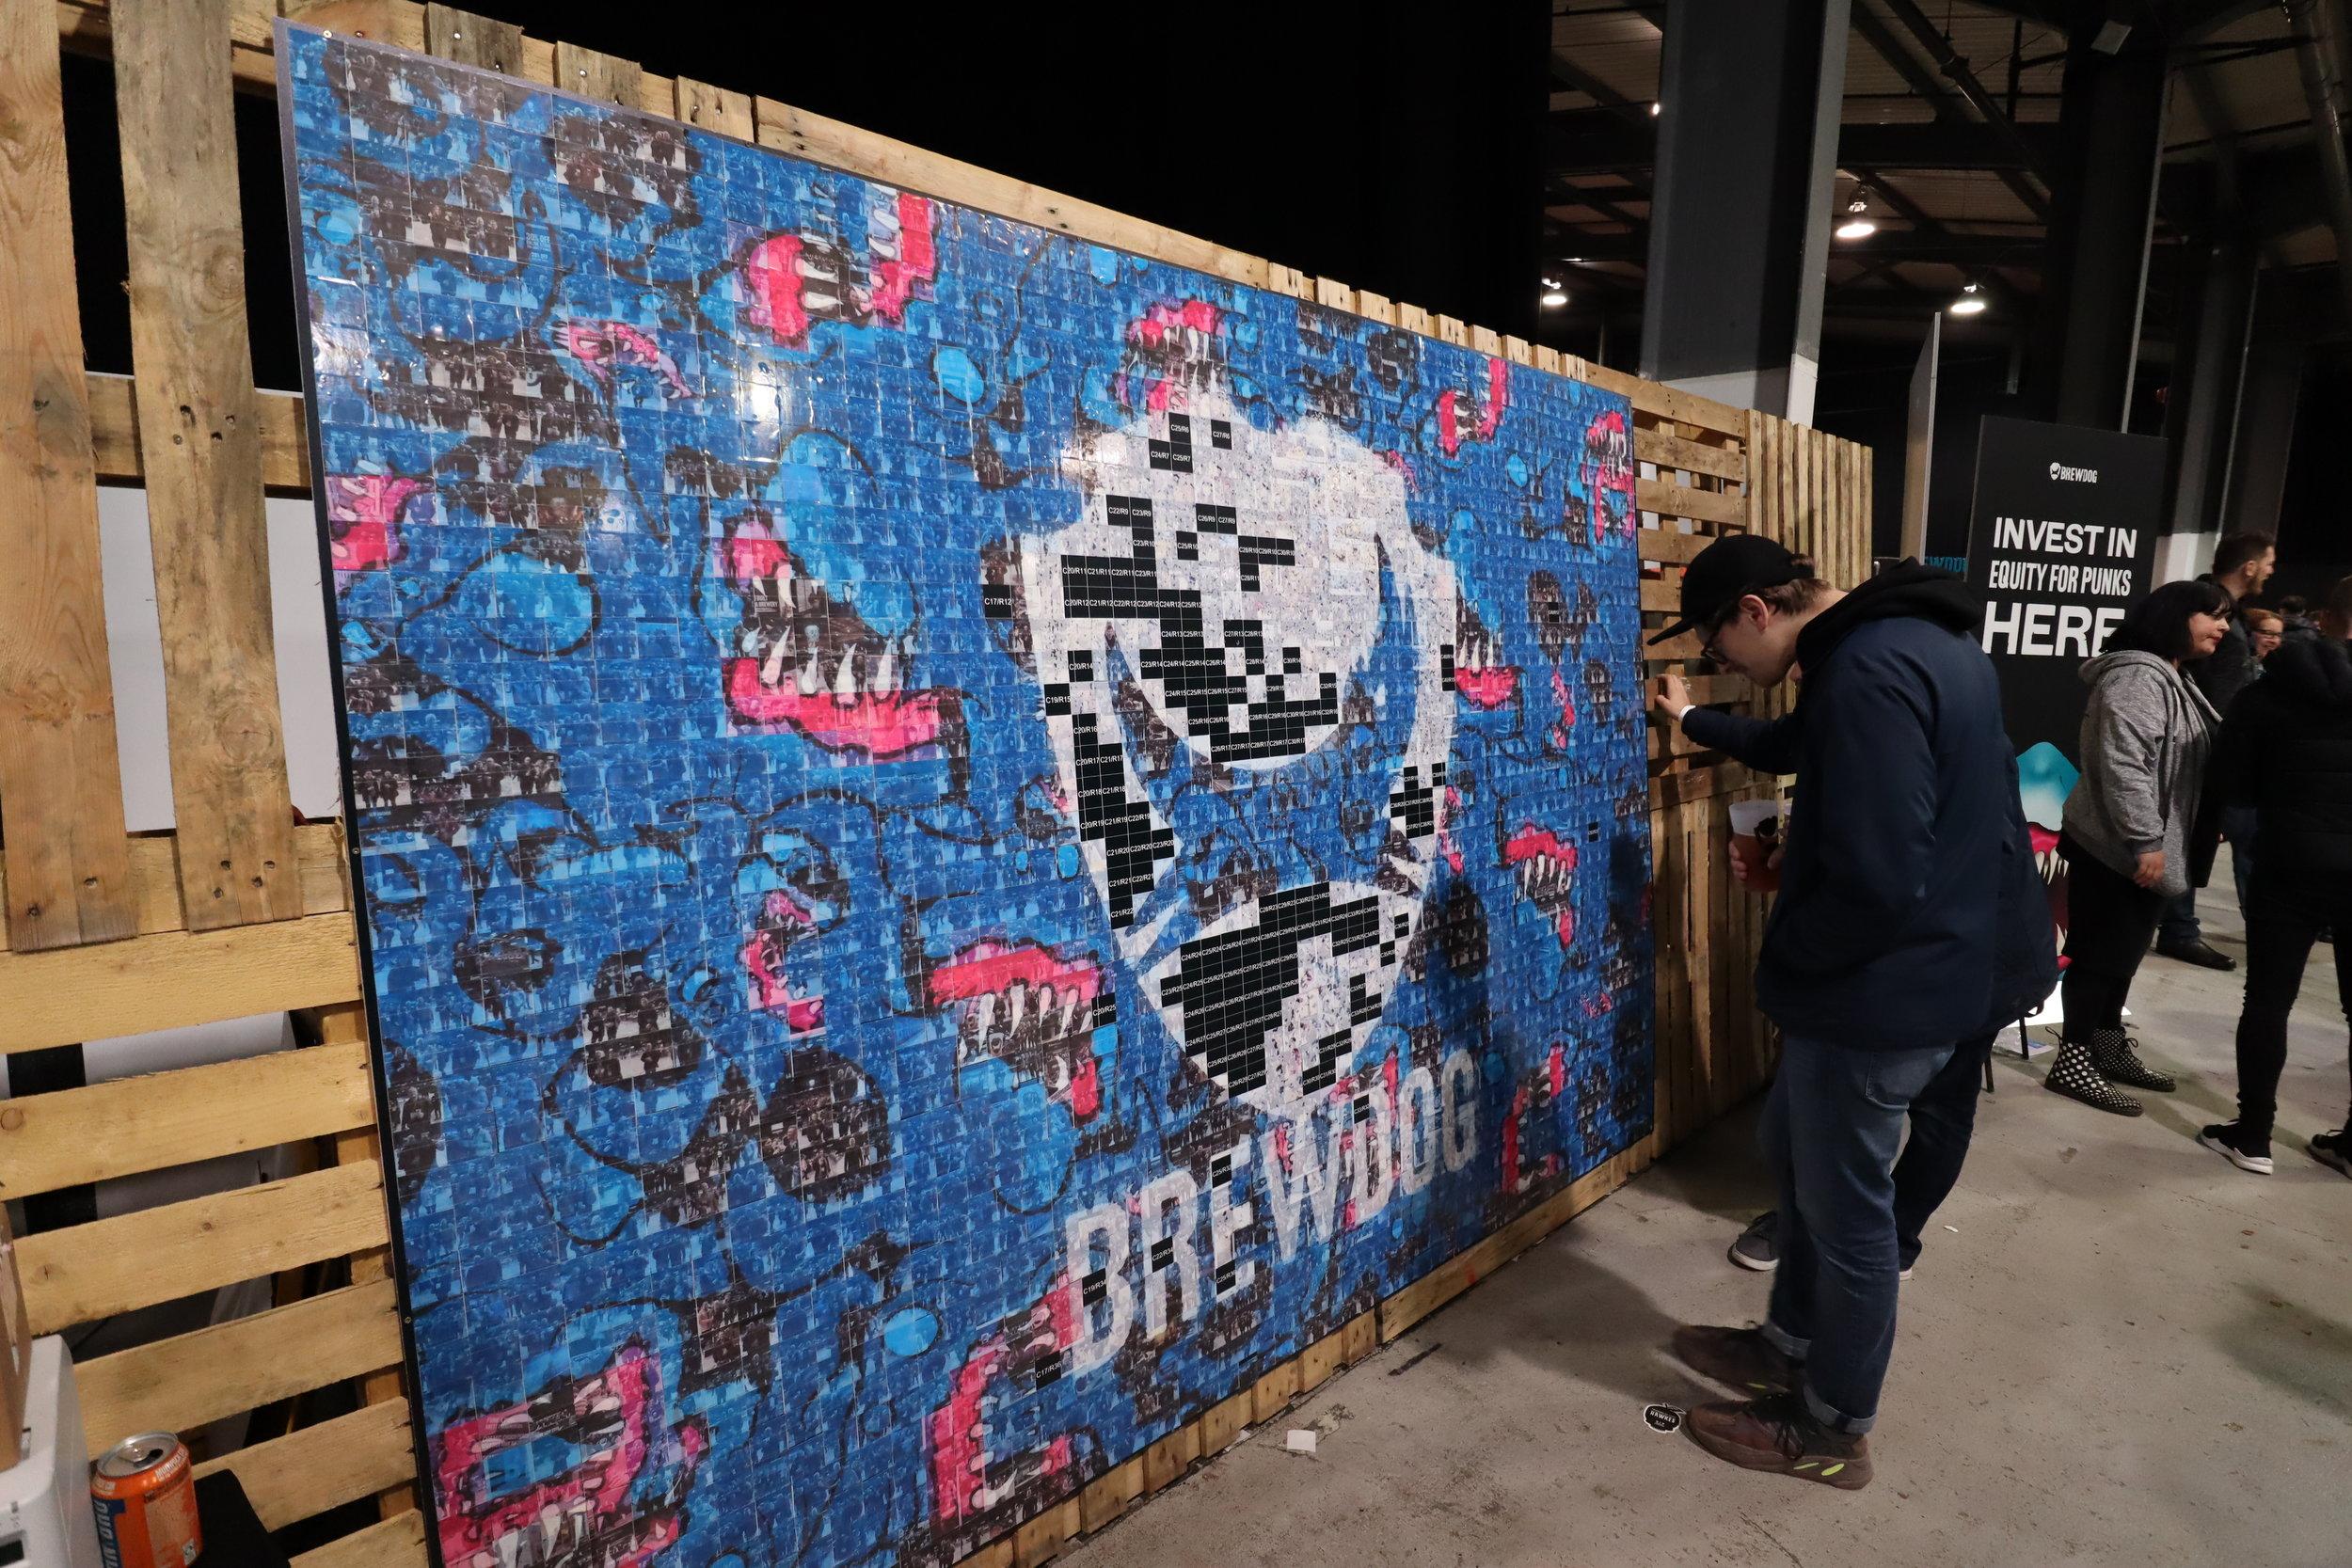 Brew Dog social mosaic